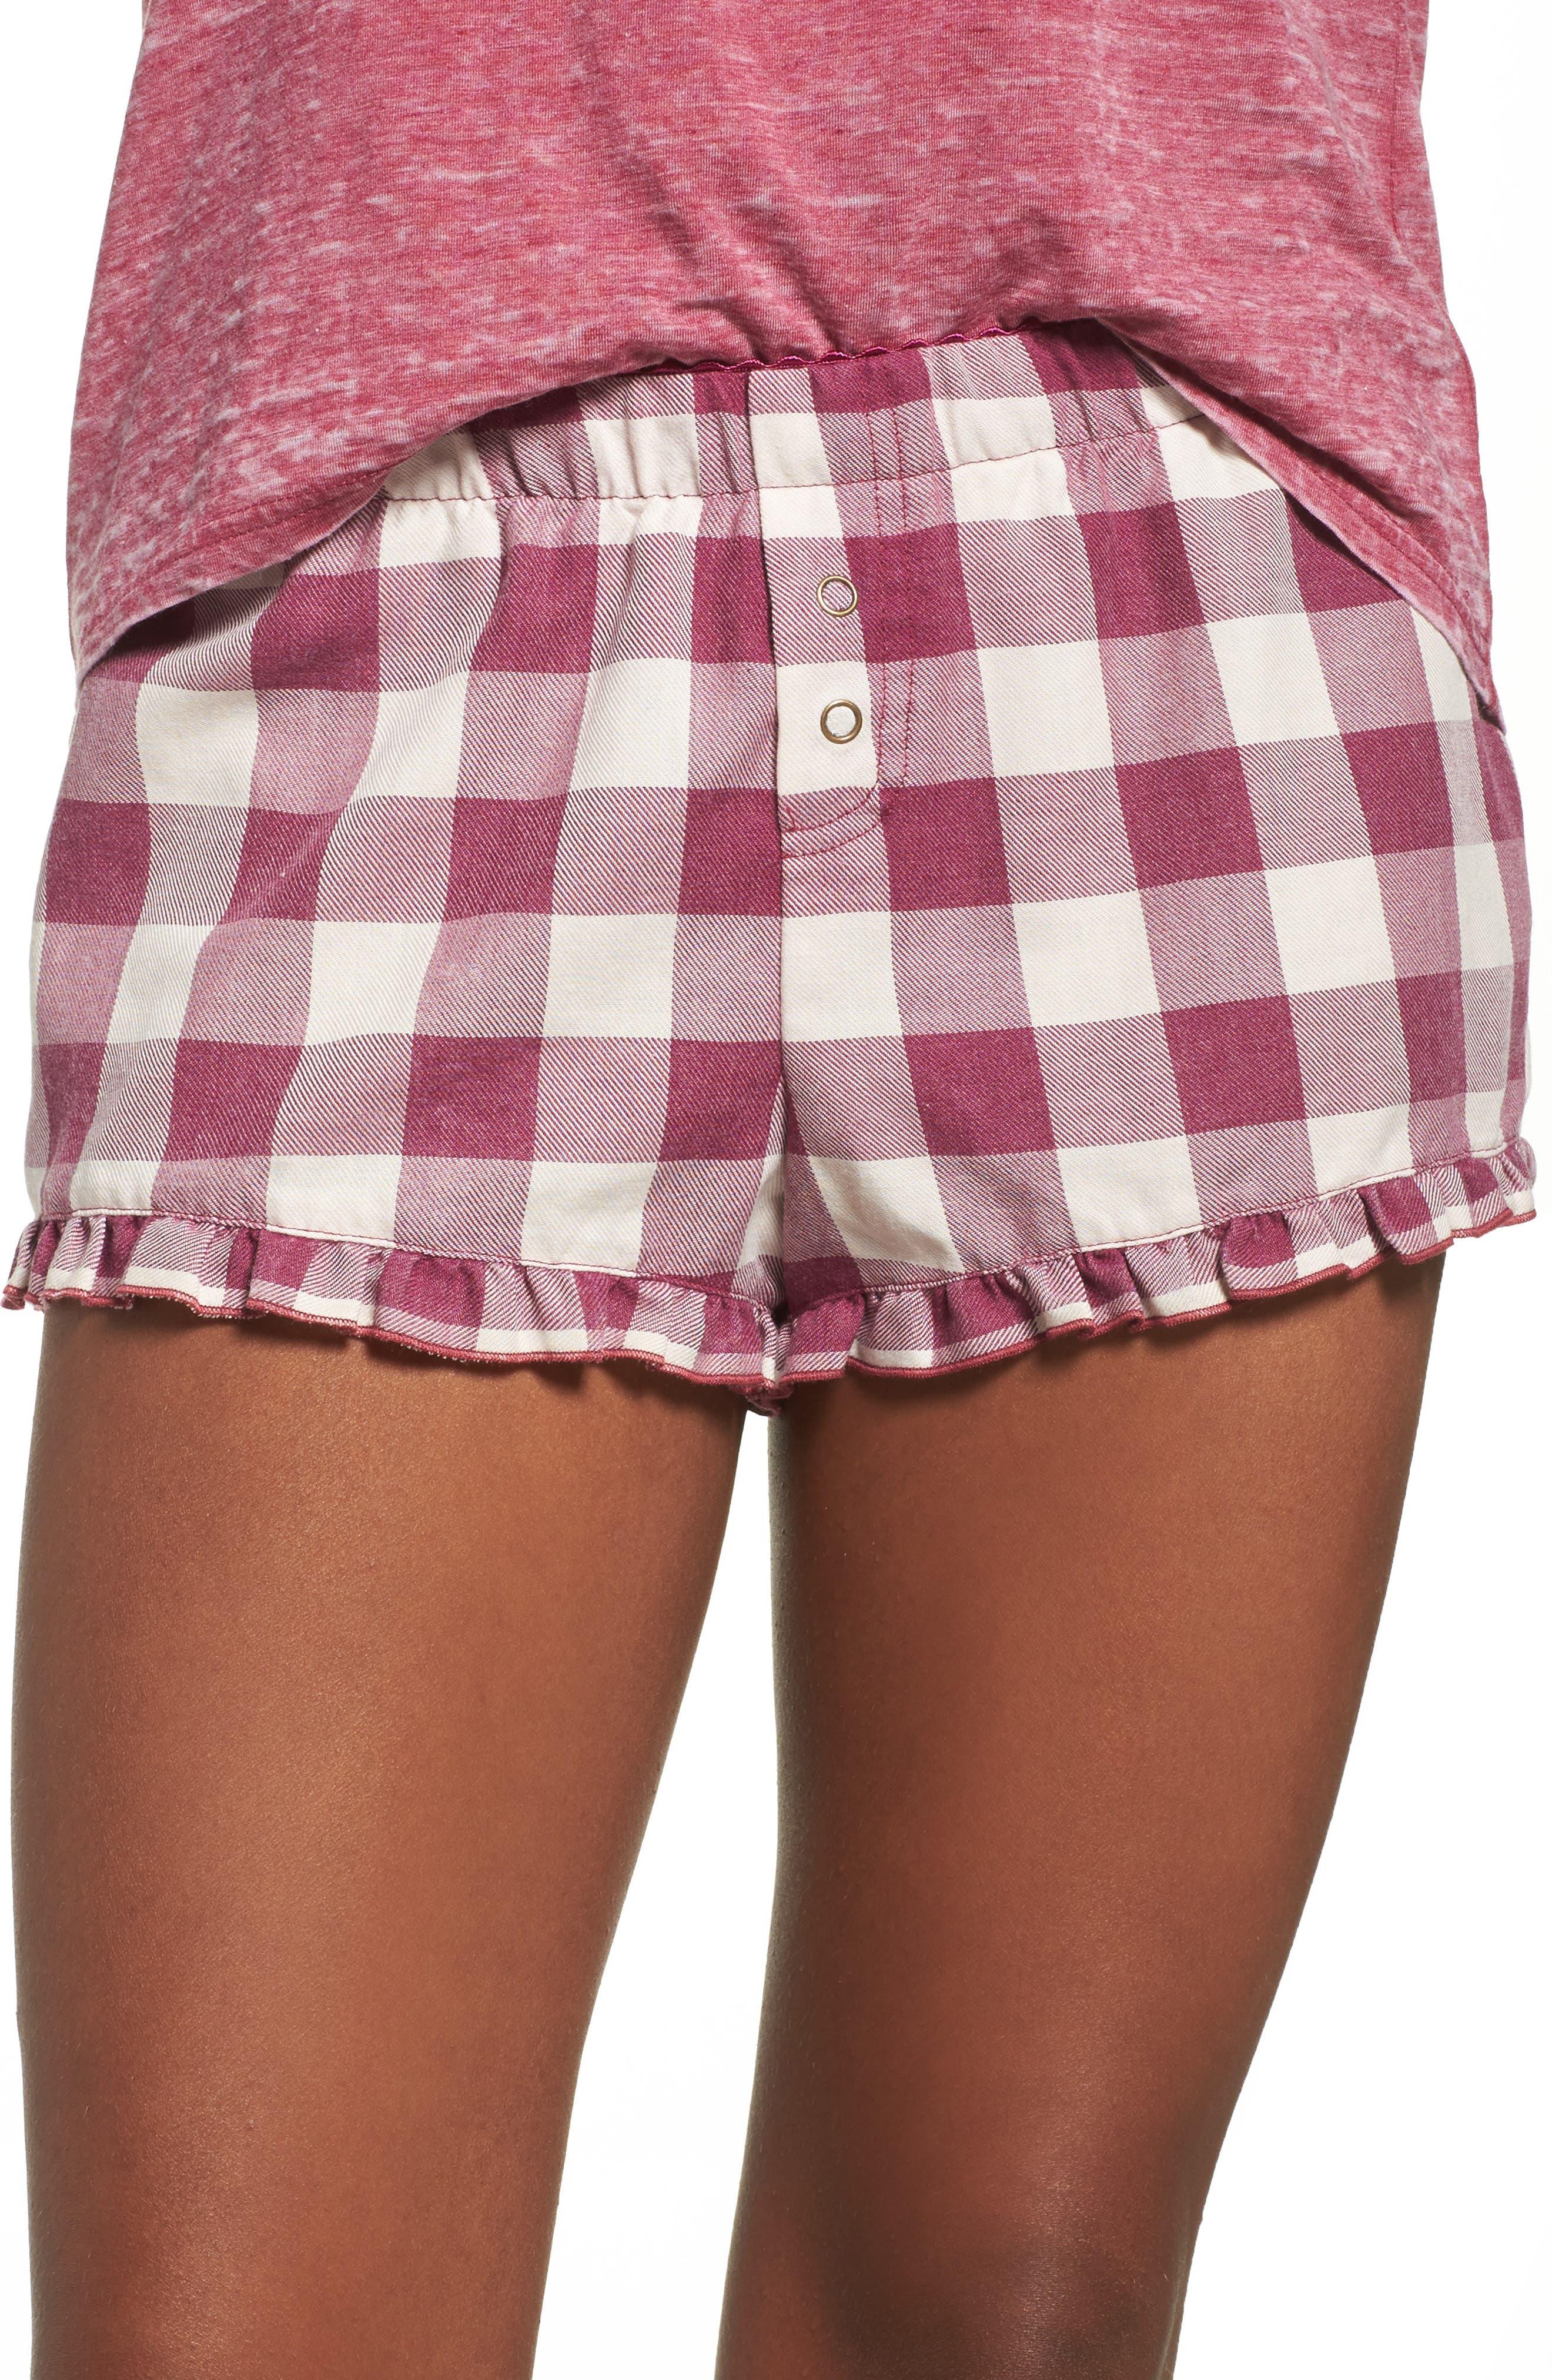 Alternate Image 1 Selected - Make + Model Boxer Shorts